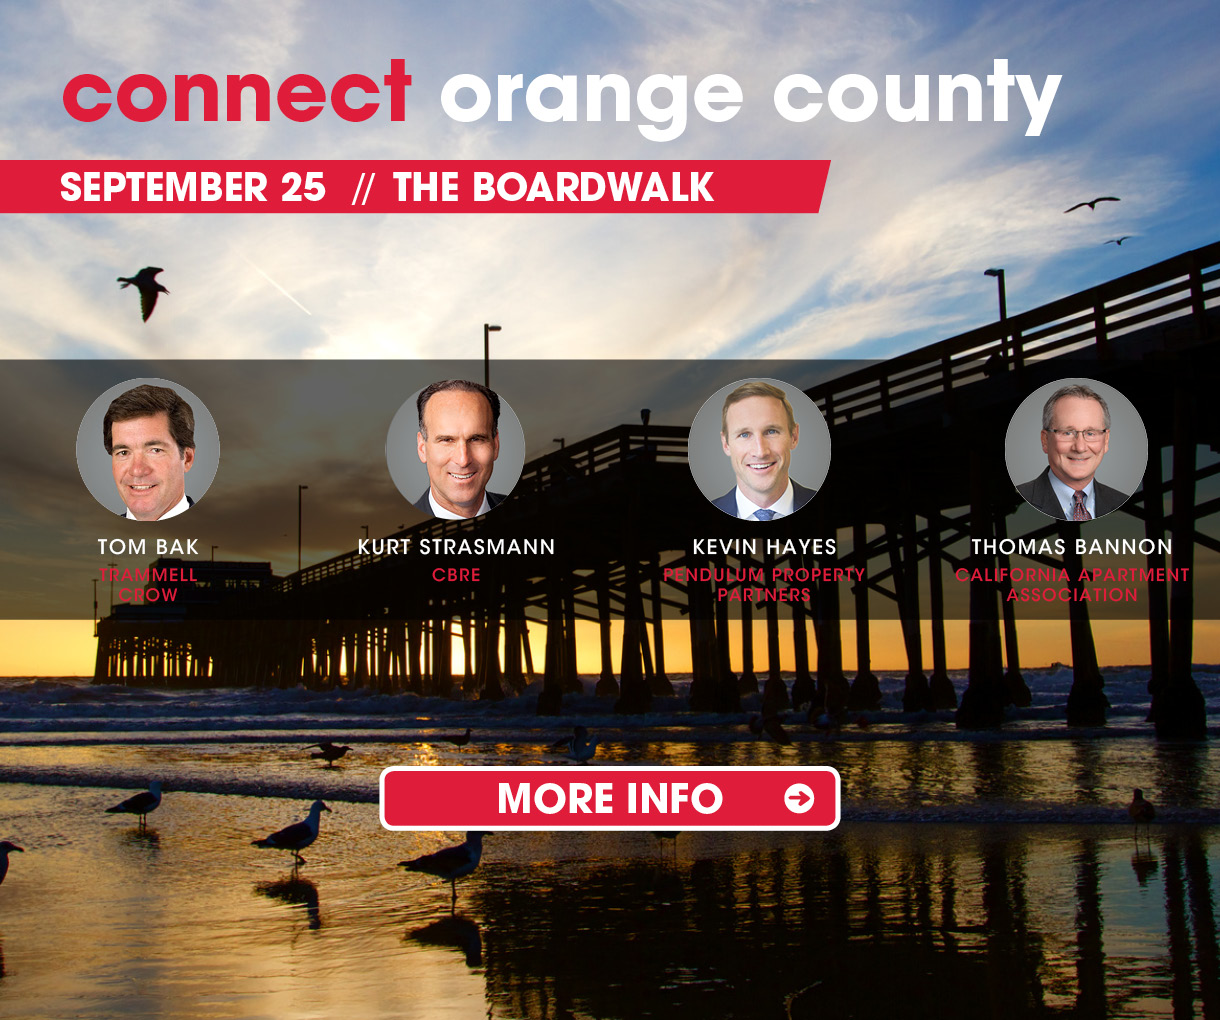 Hook up Orange County